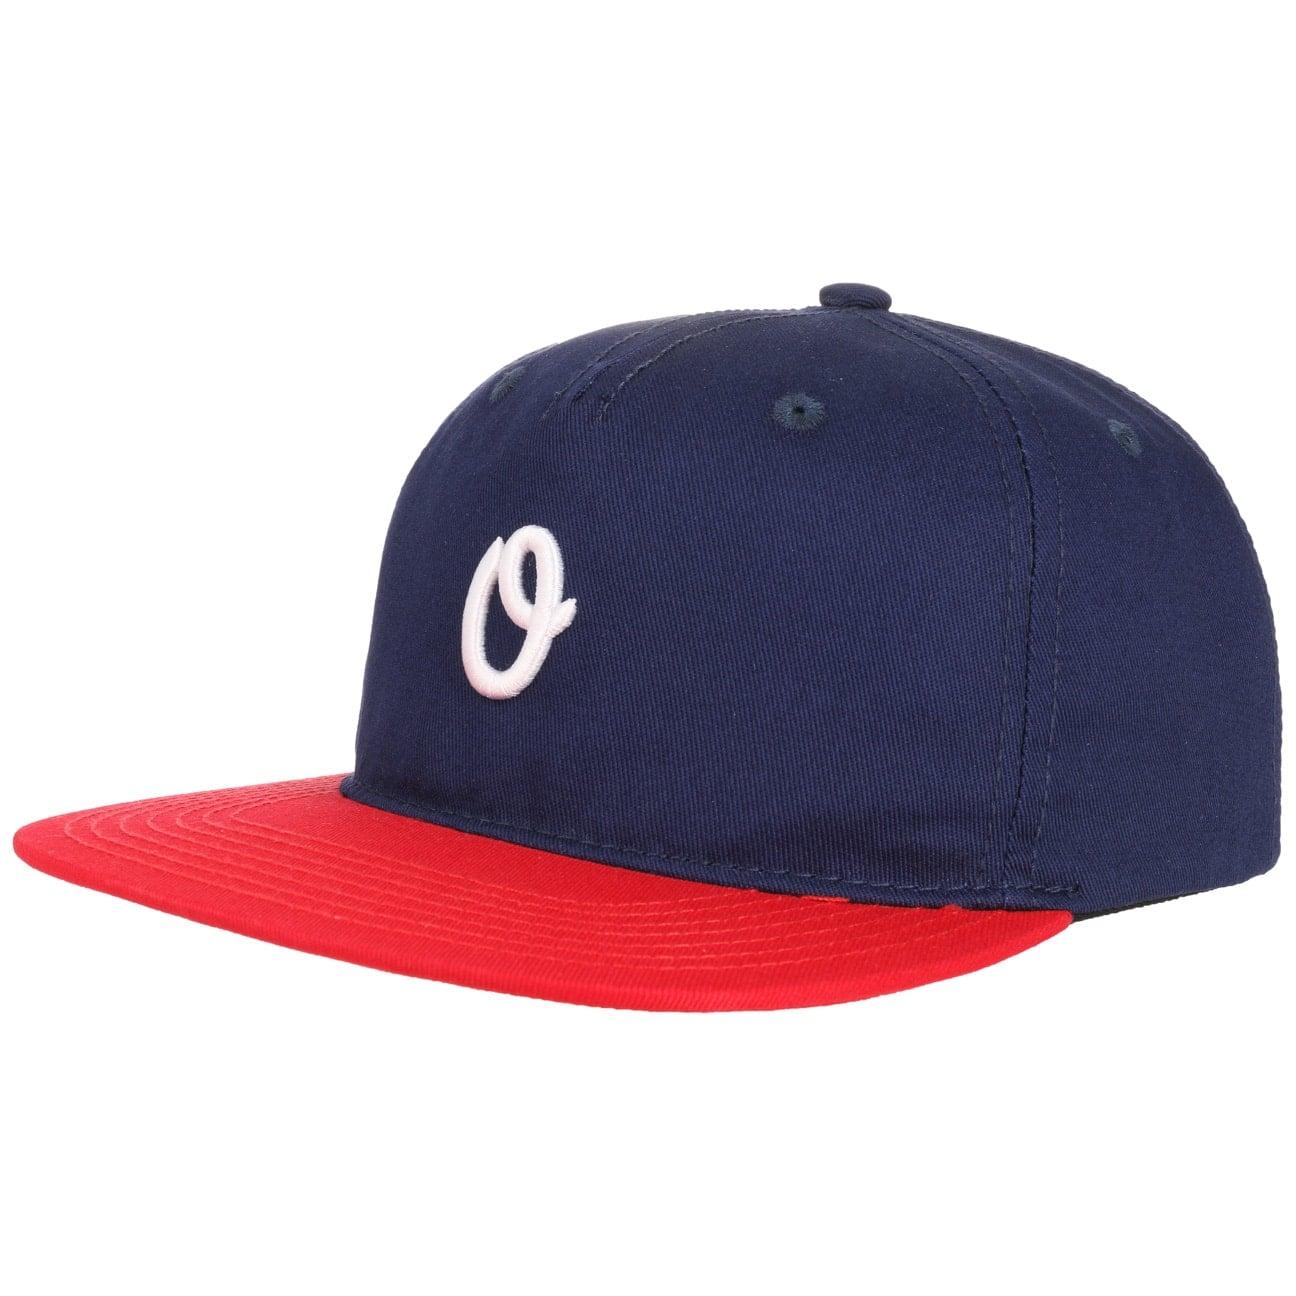 Casquette Olo EvDay 2Tone by Official Headwear  baseball cap